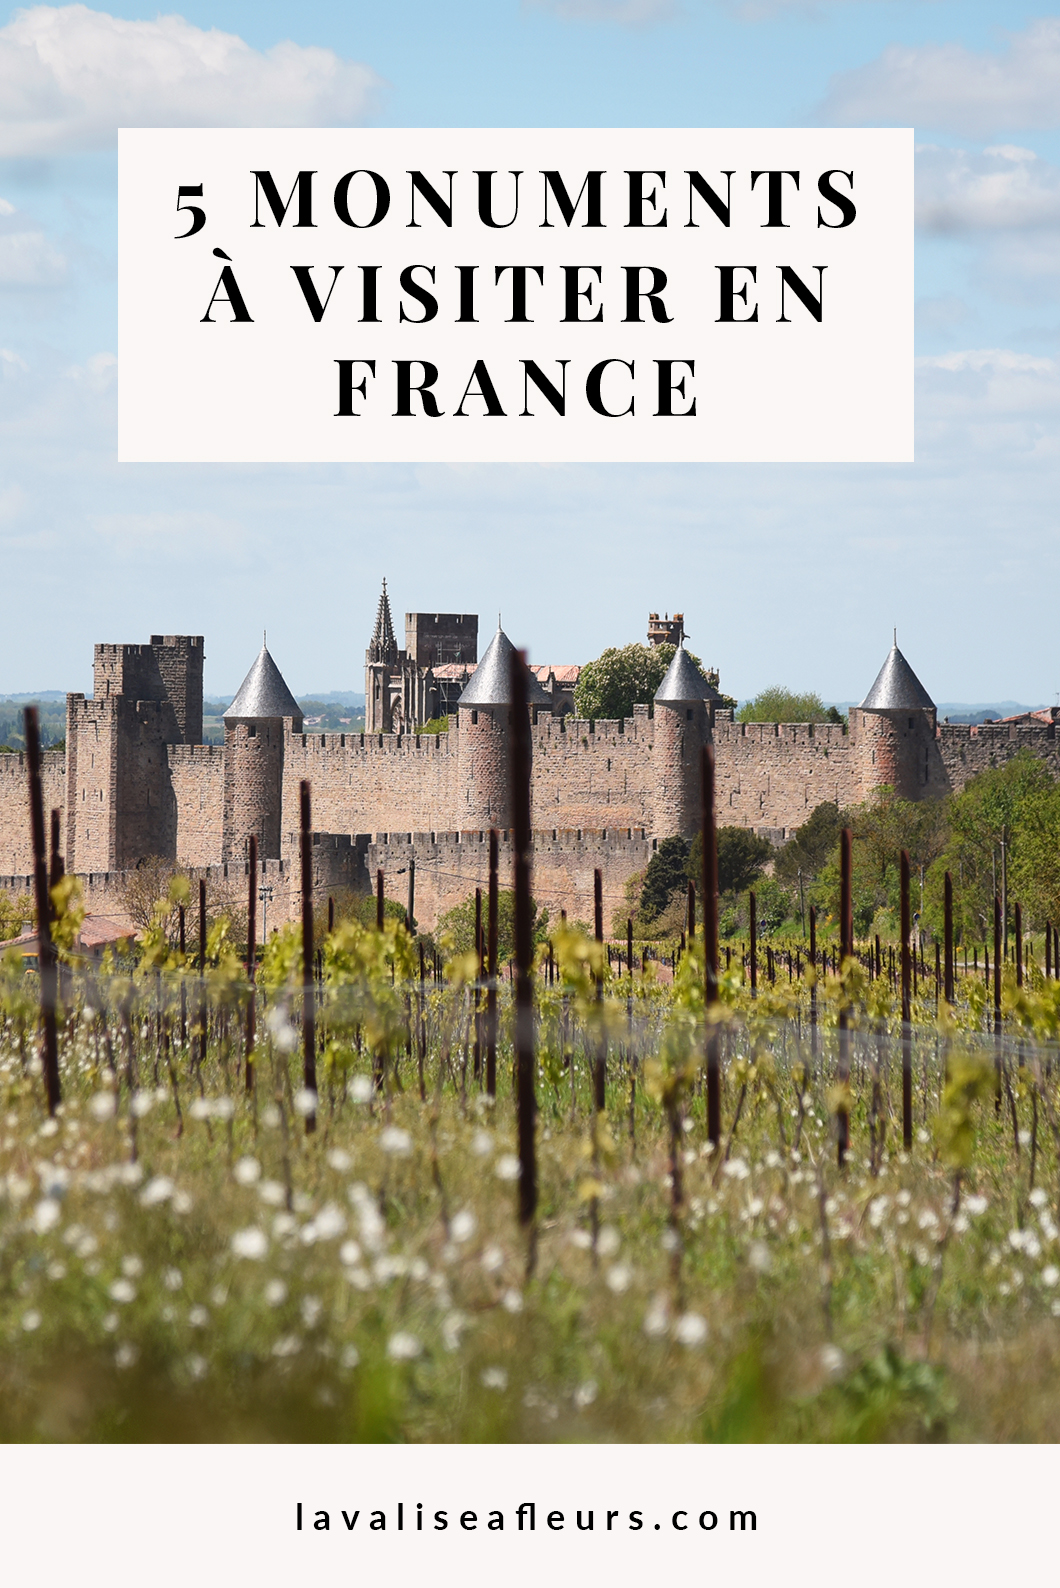 5 monuments à visiter en France